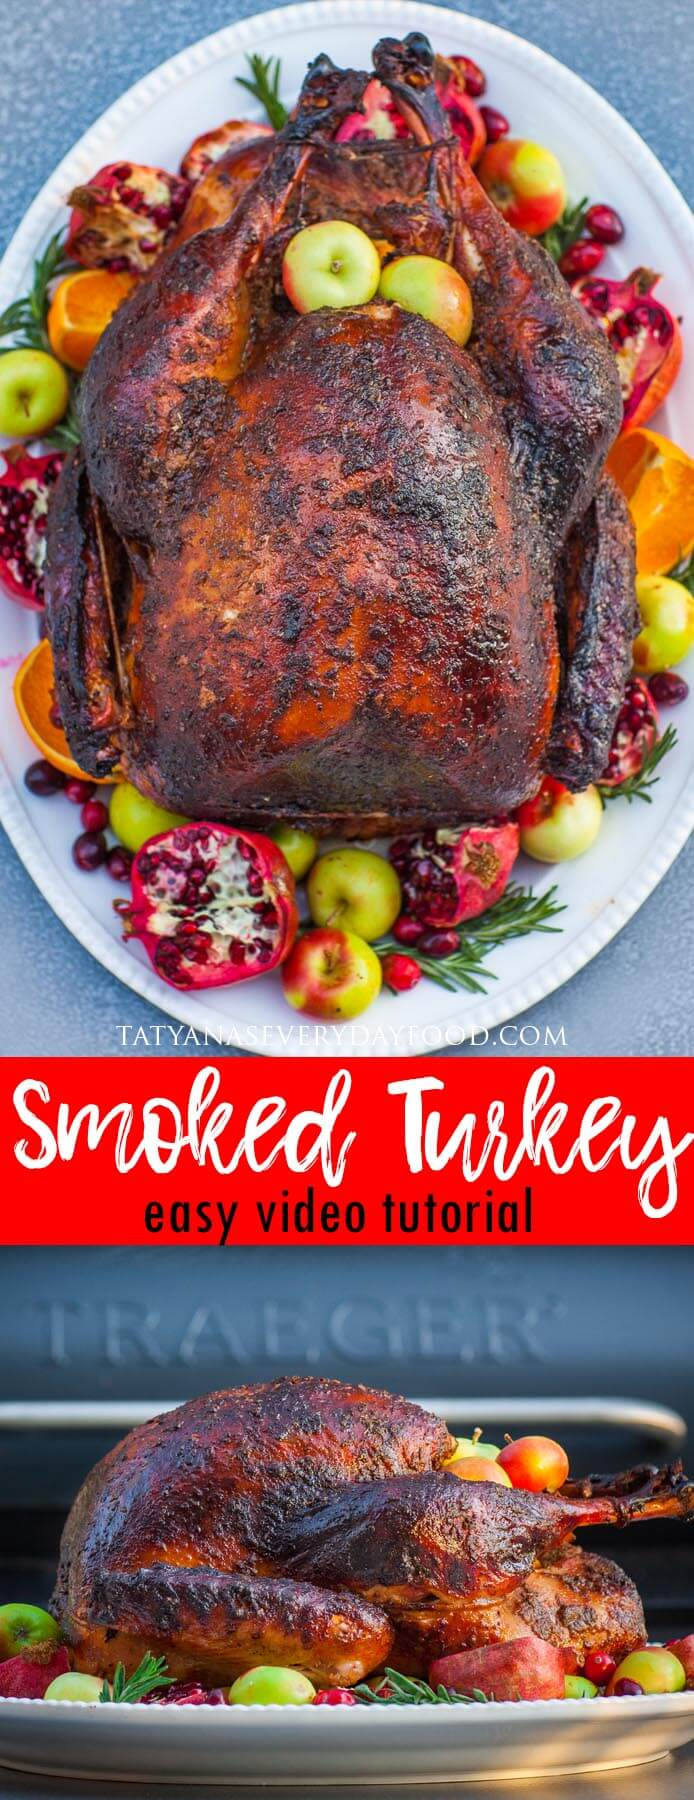 How to Smoke a Turkey Video Tutorial